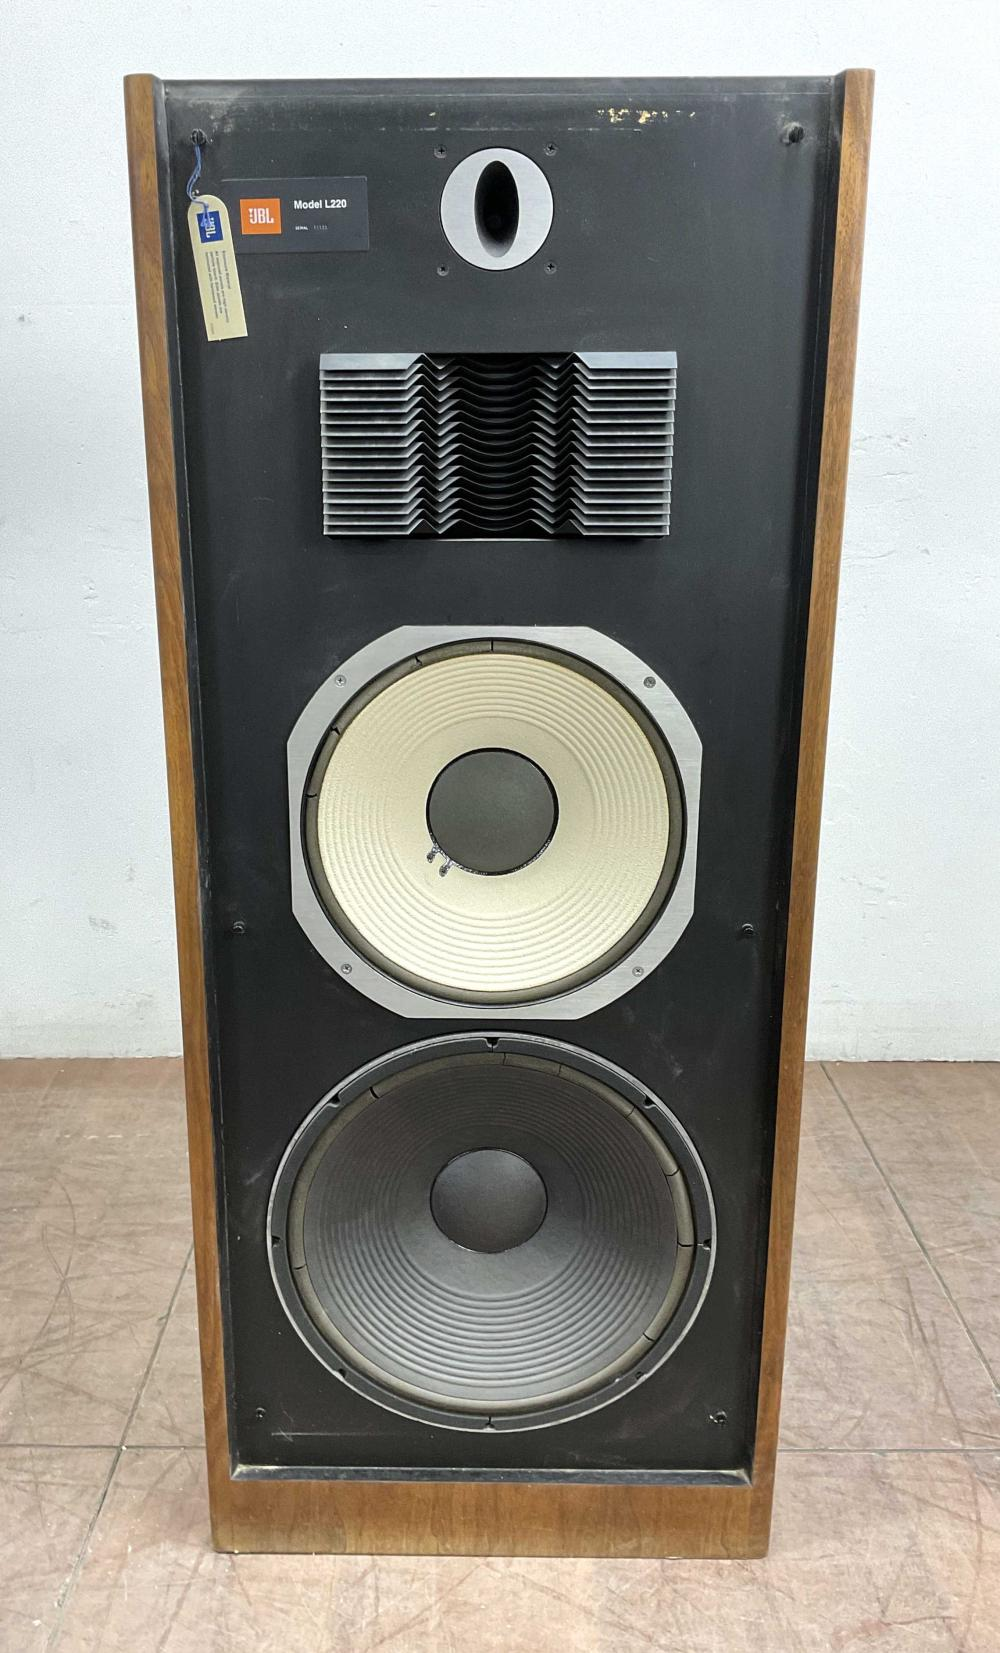 Jbl Model L220 Floor Loudspeaker System